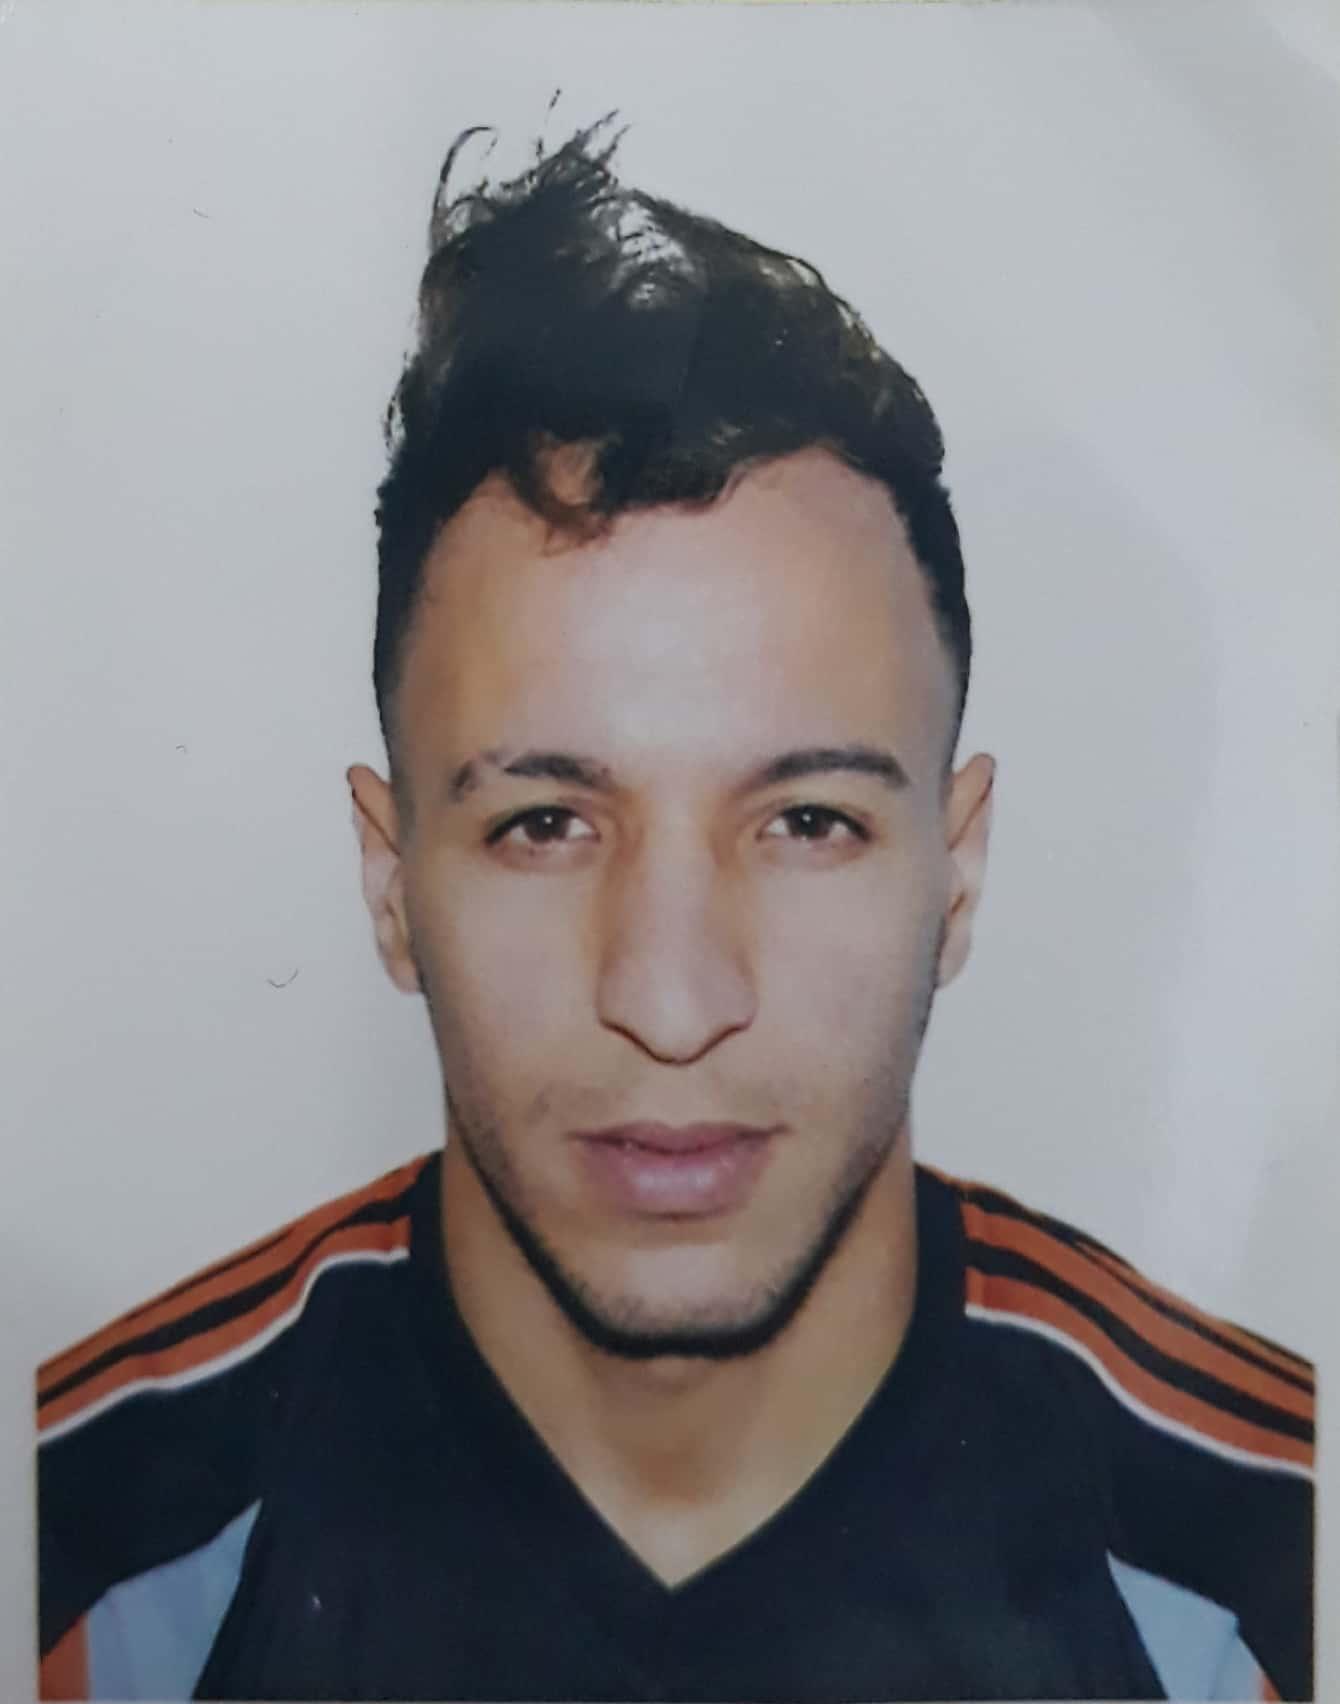 AZZOUZ Abdelmoutalib